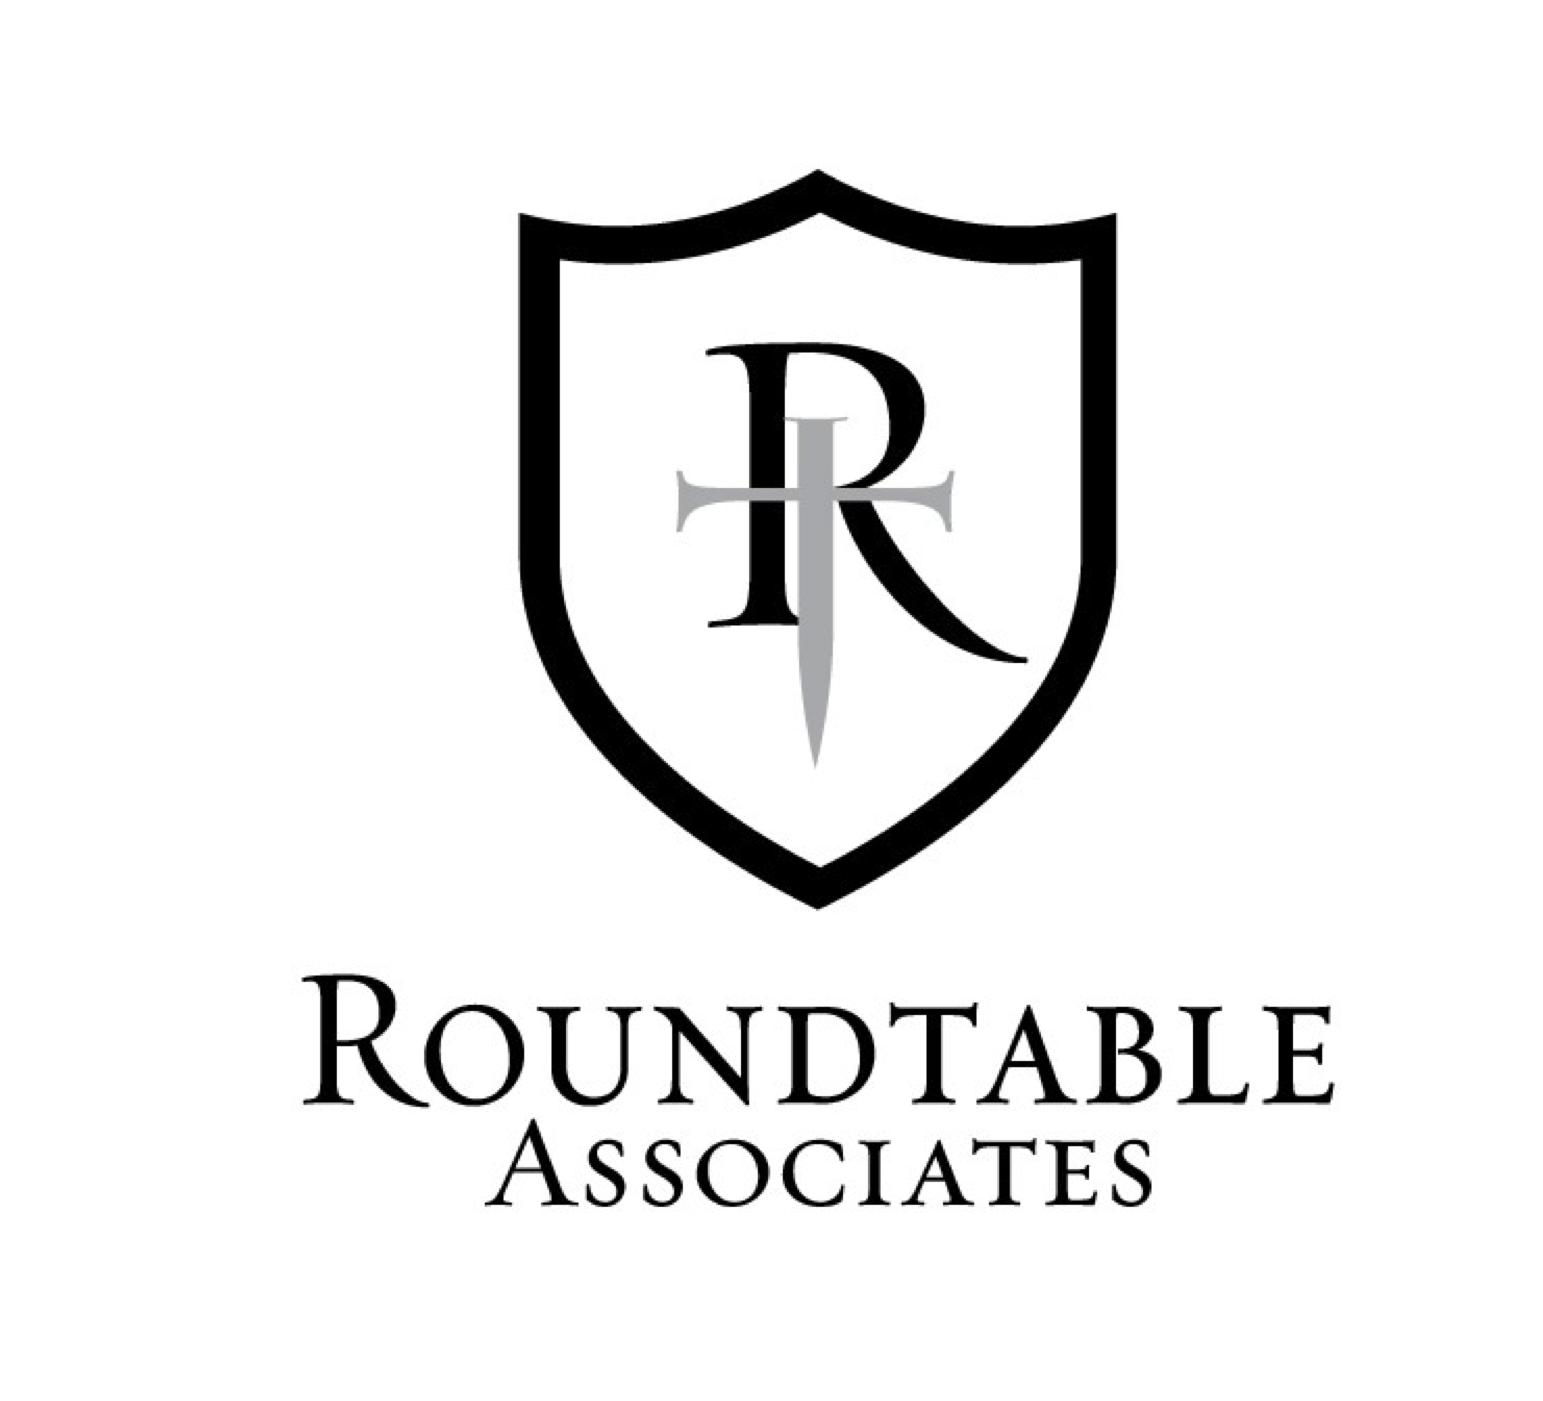 RoundTable Associates